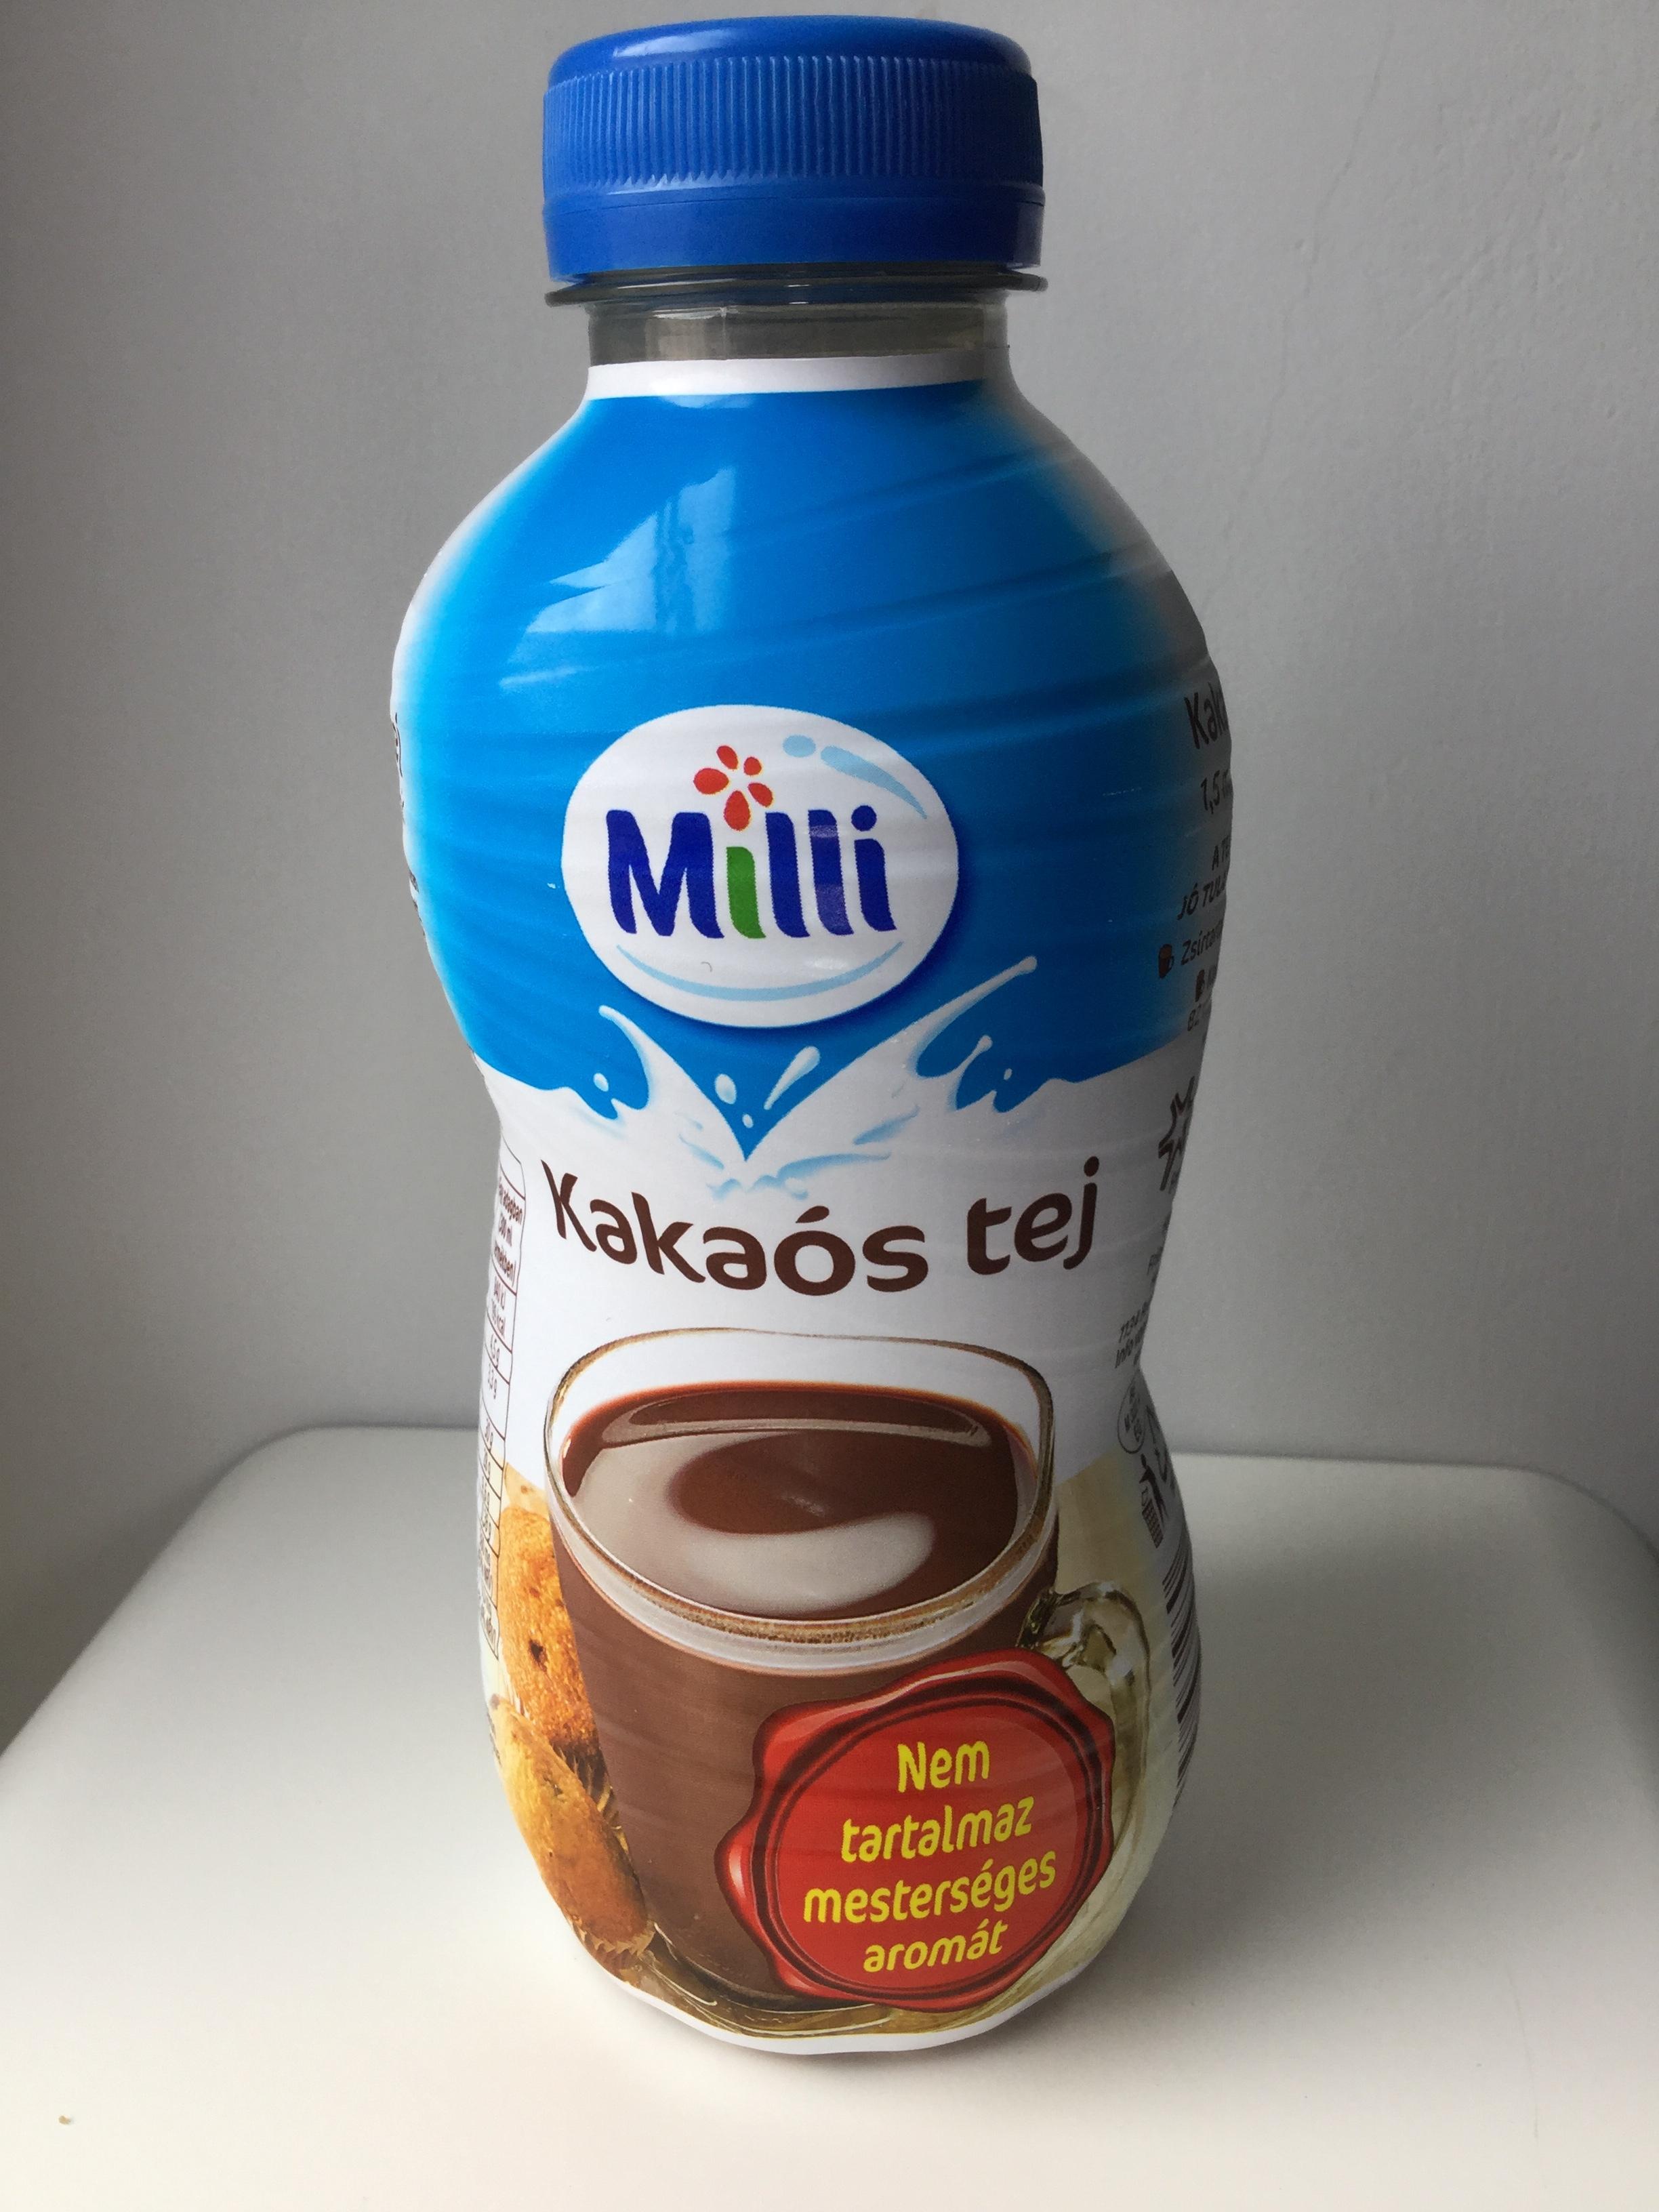 Milli Kakaos Tej Side 3